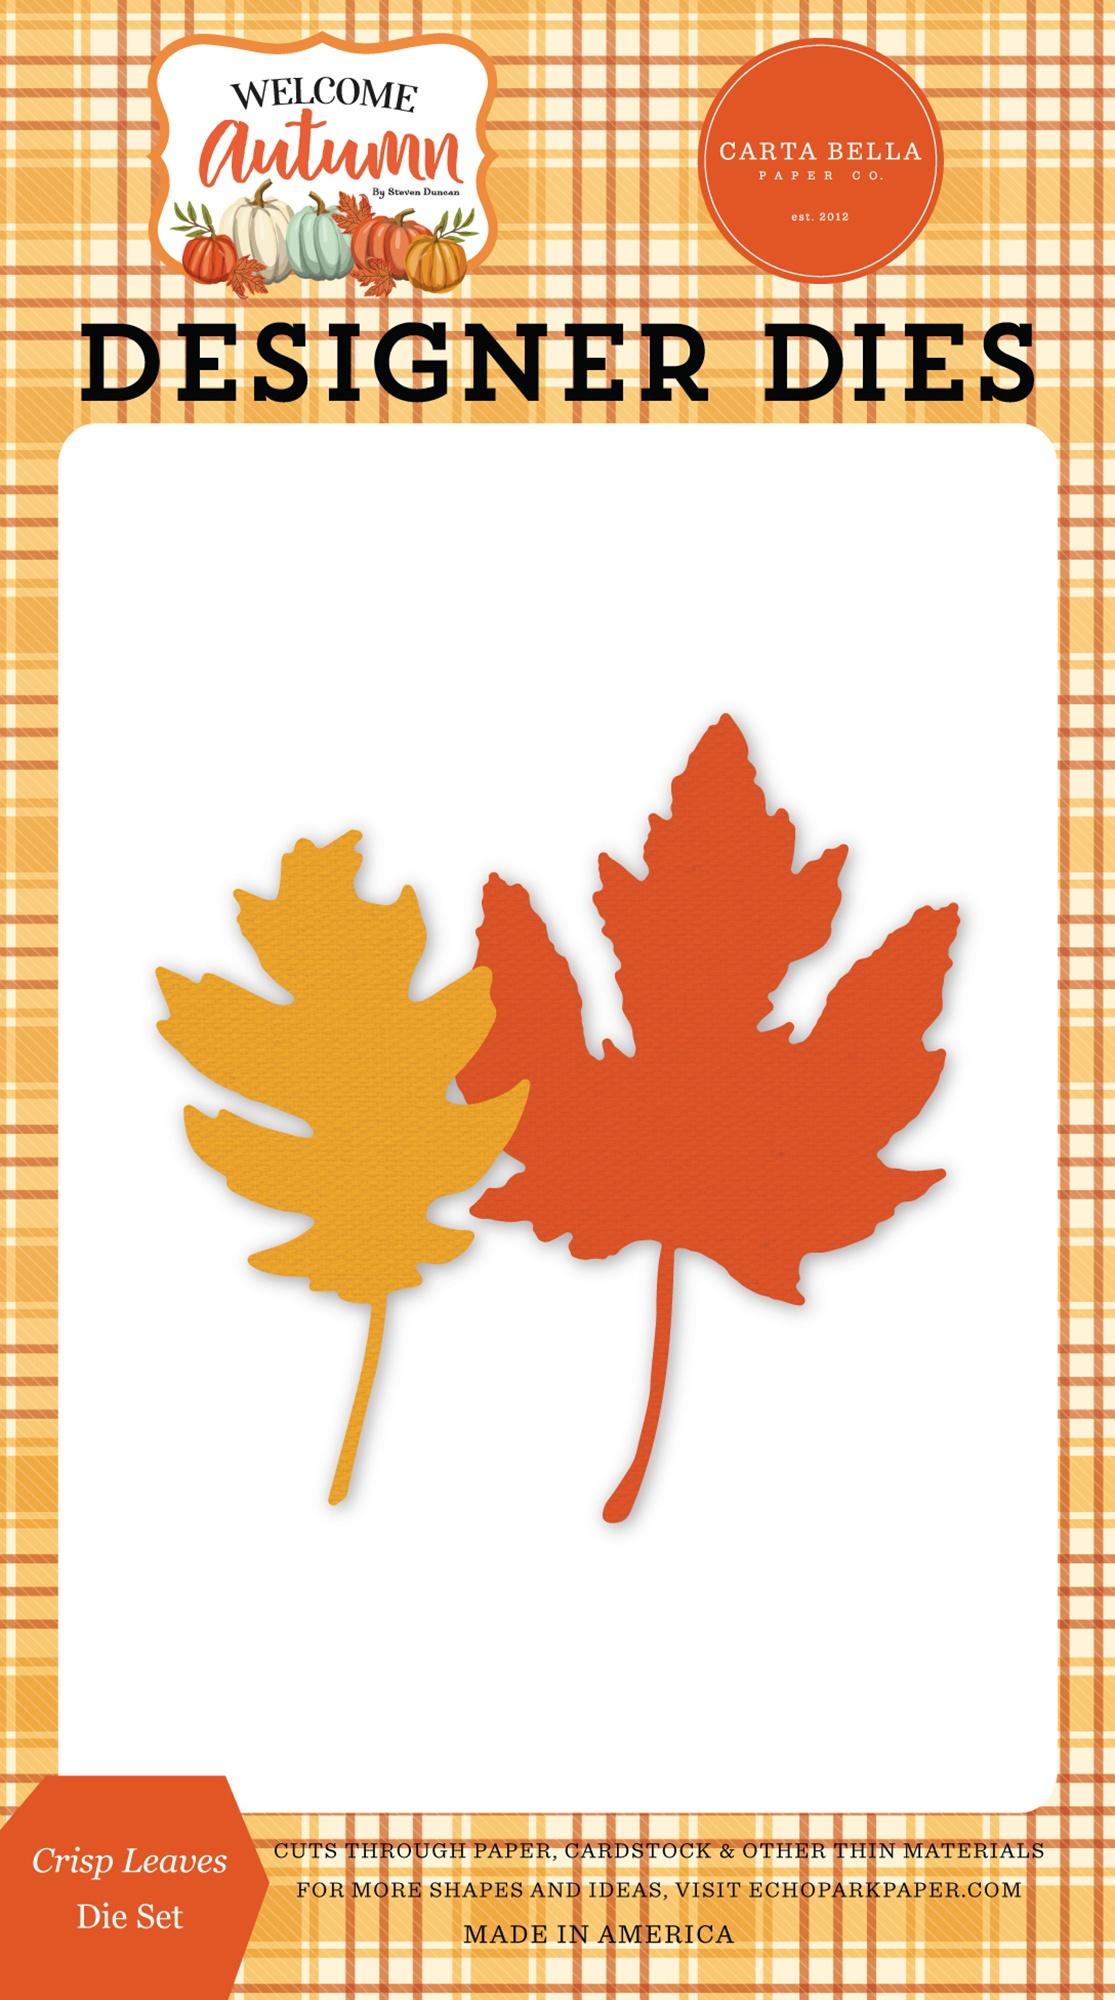 Carte Bella Autumn Welcome Collection Dies-Crisp Leaves - Matrice feuilles d'automne